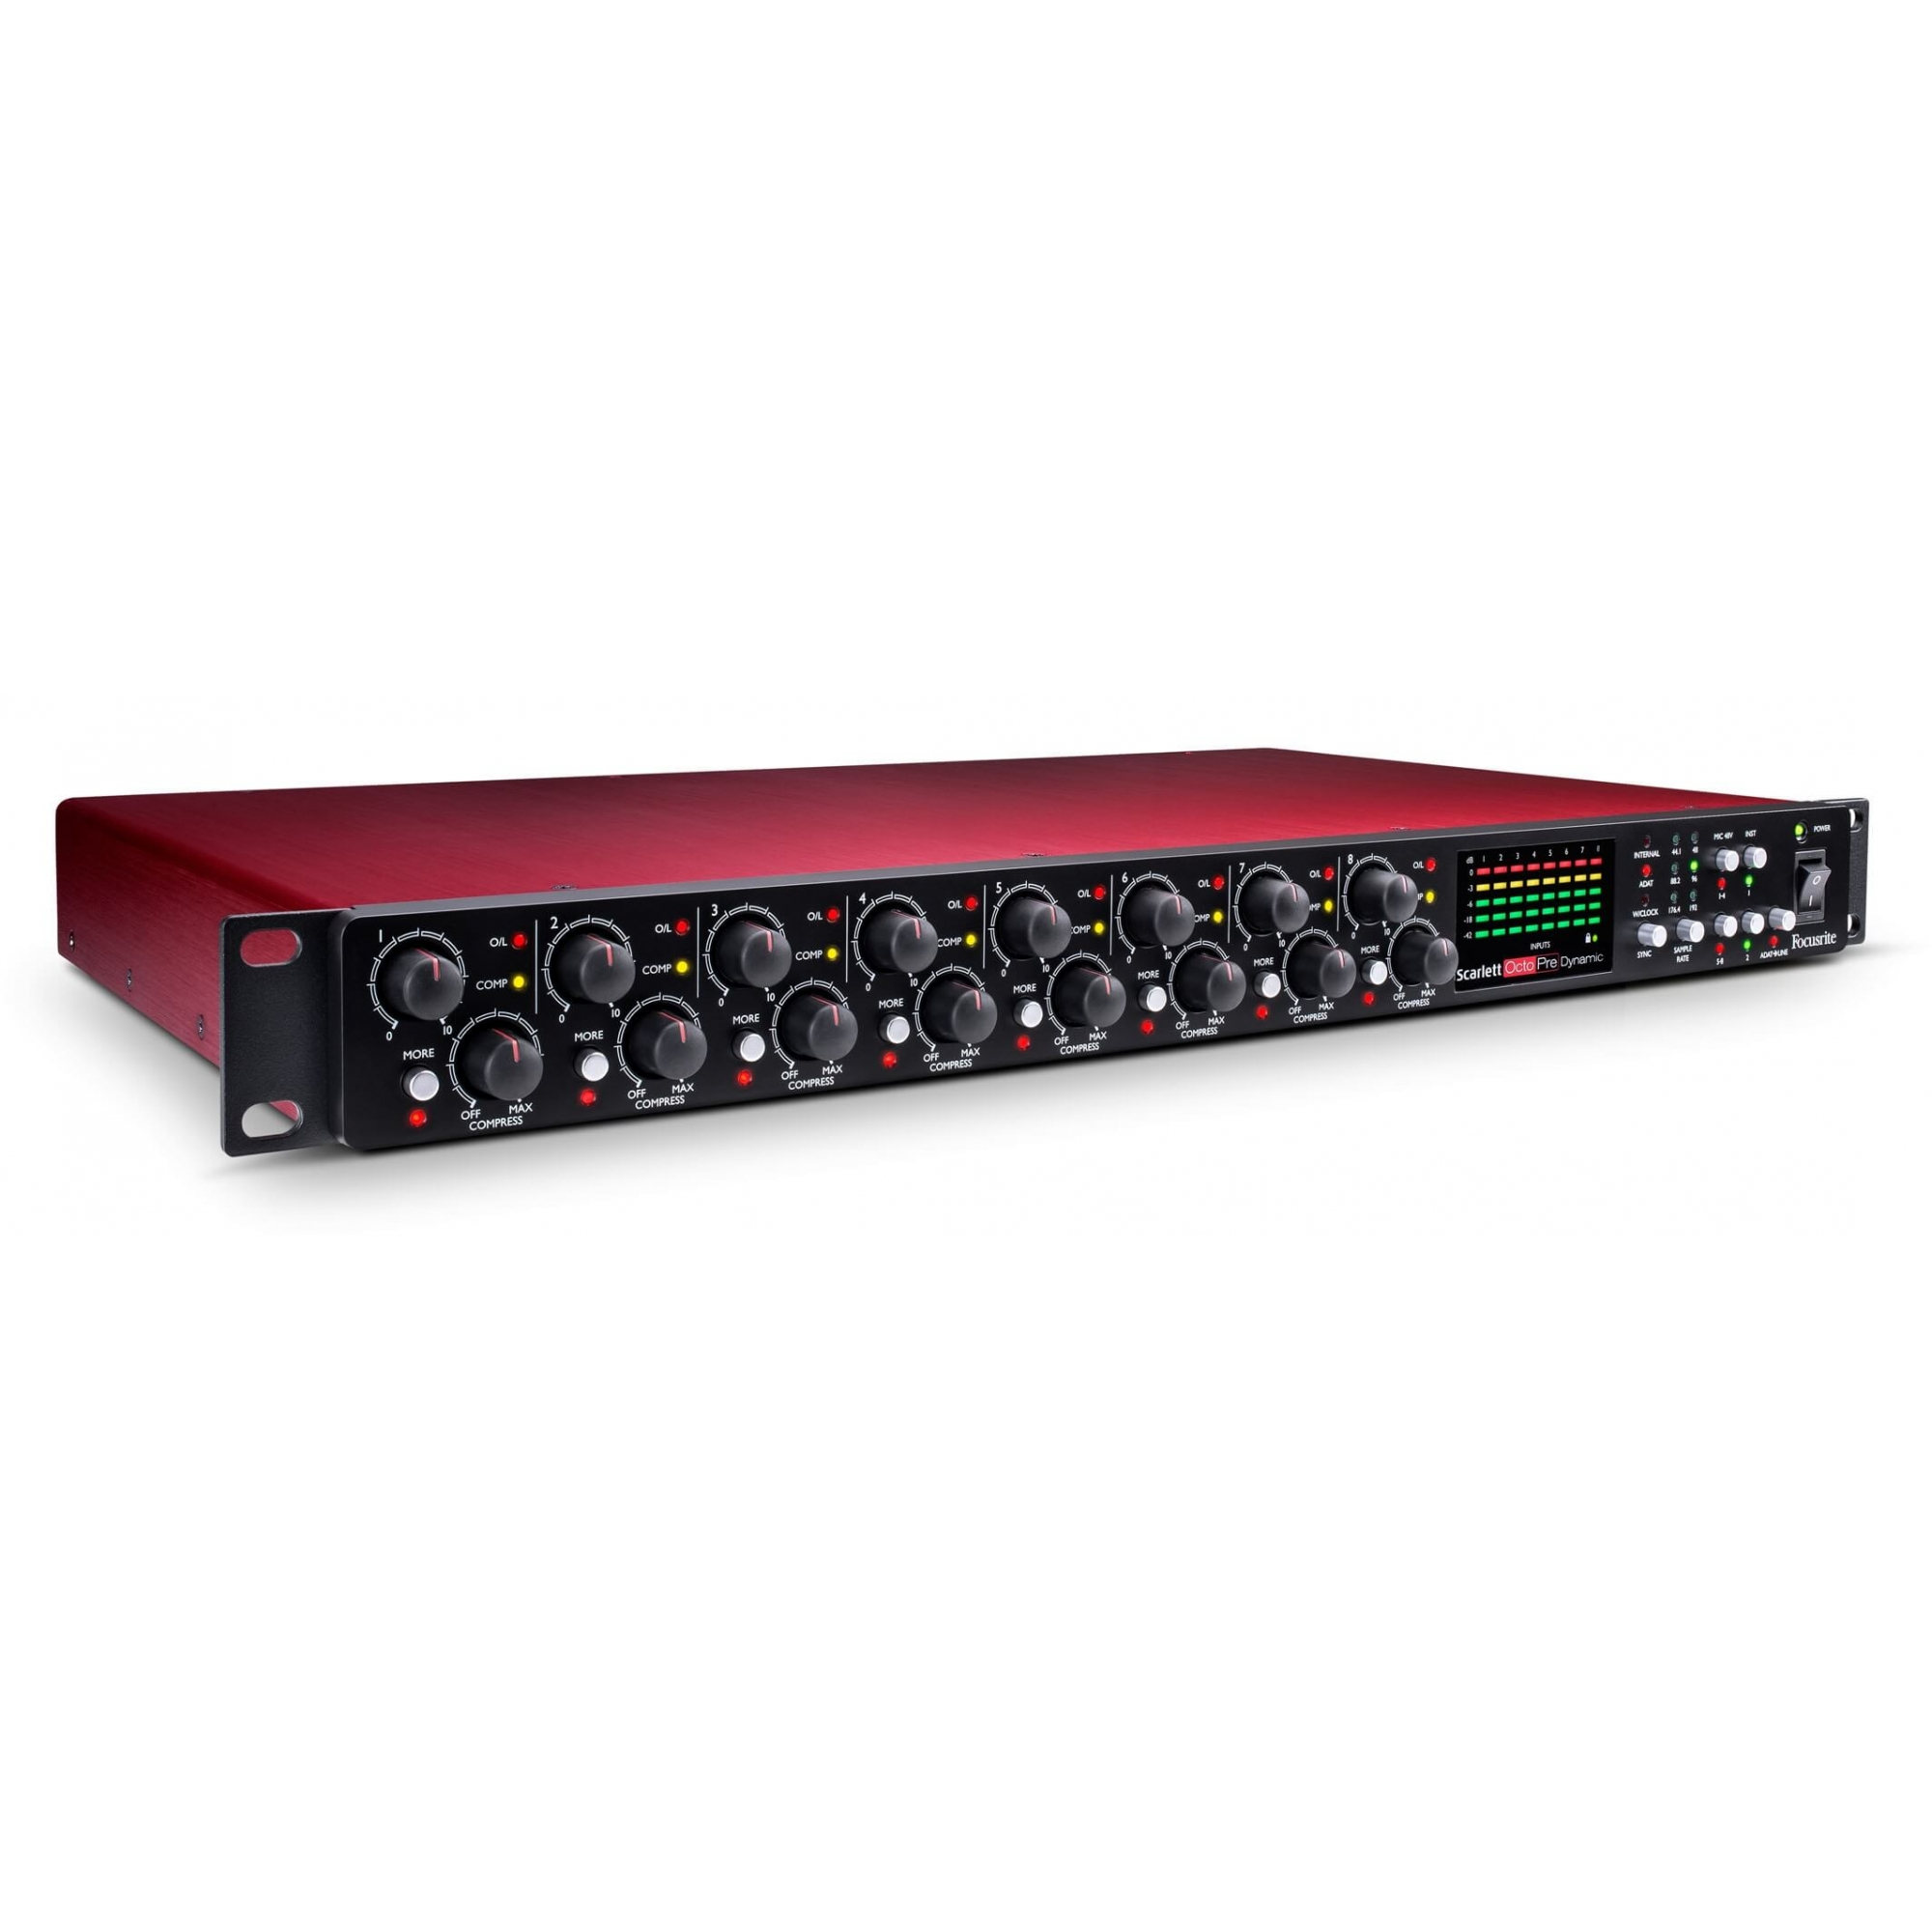 Focusrite Scarlett Octopre Dynamic Interface de audio  - Audio Video & cia